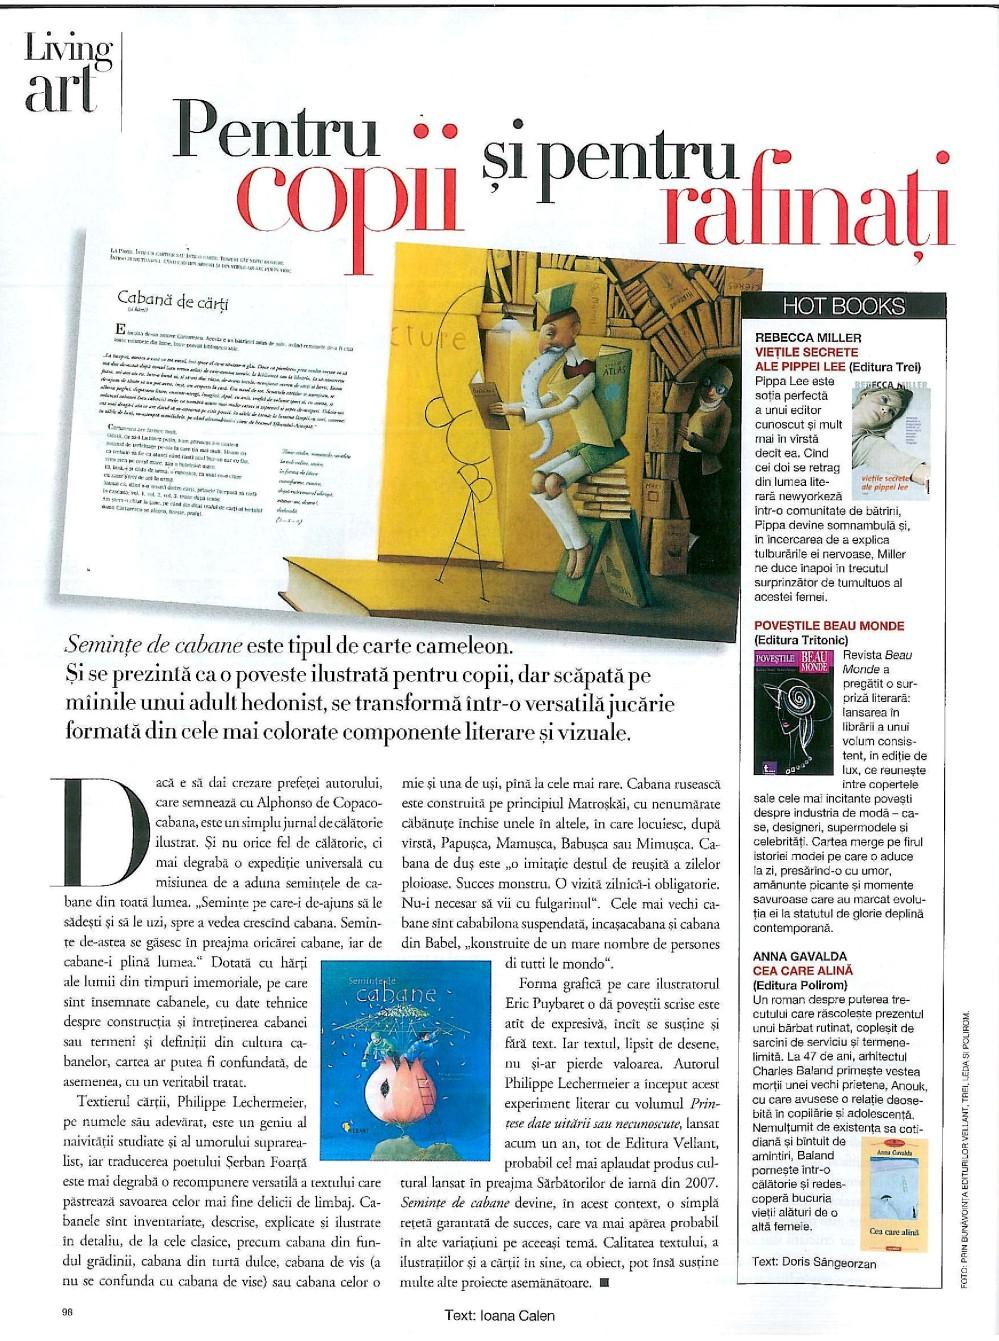 Book reviews-HBR nov 2008-page-001